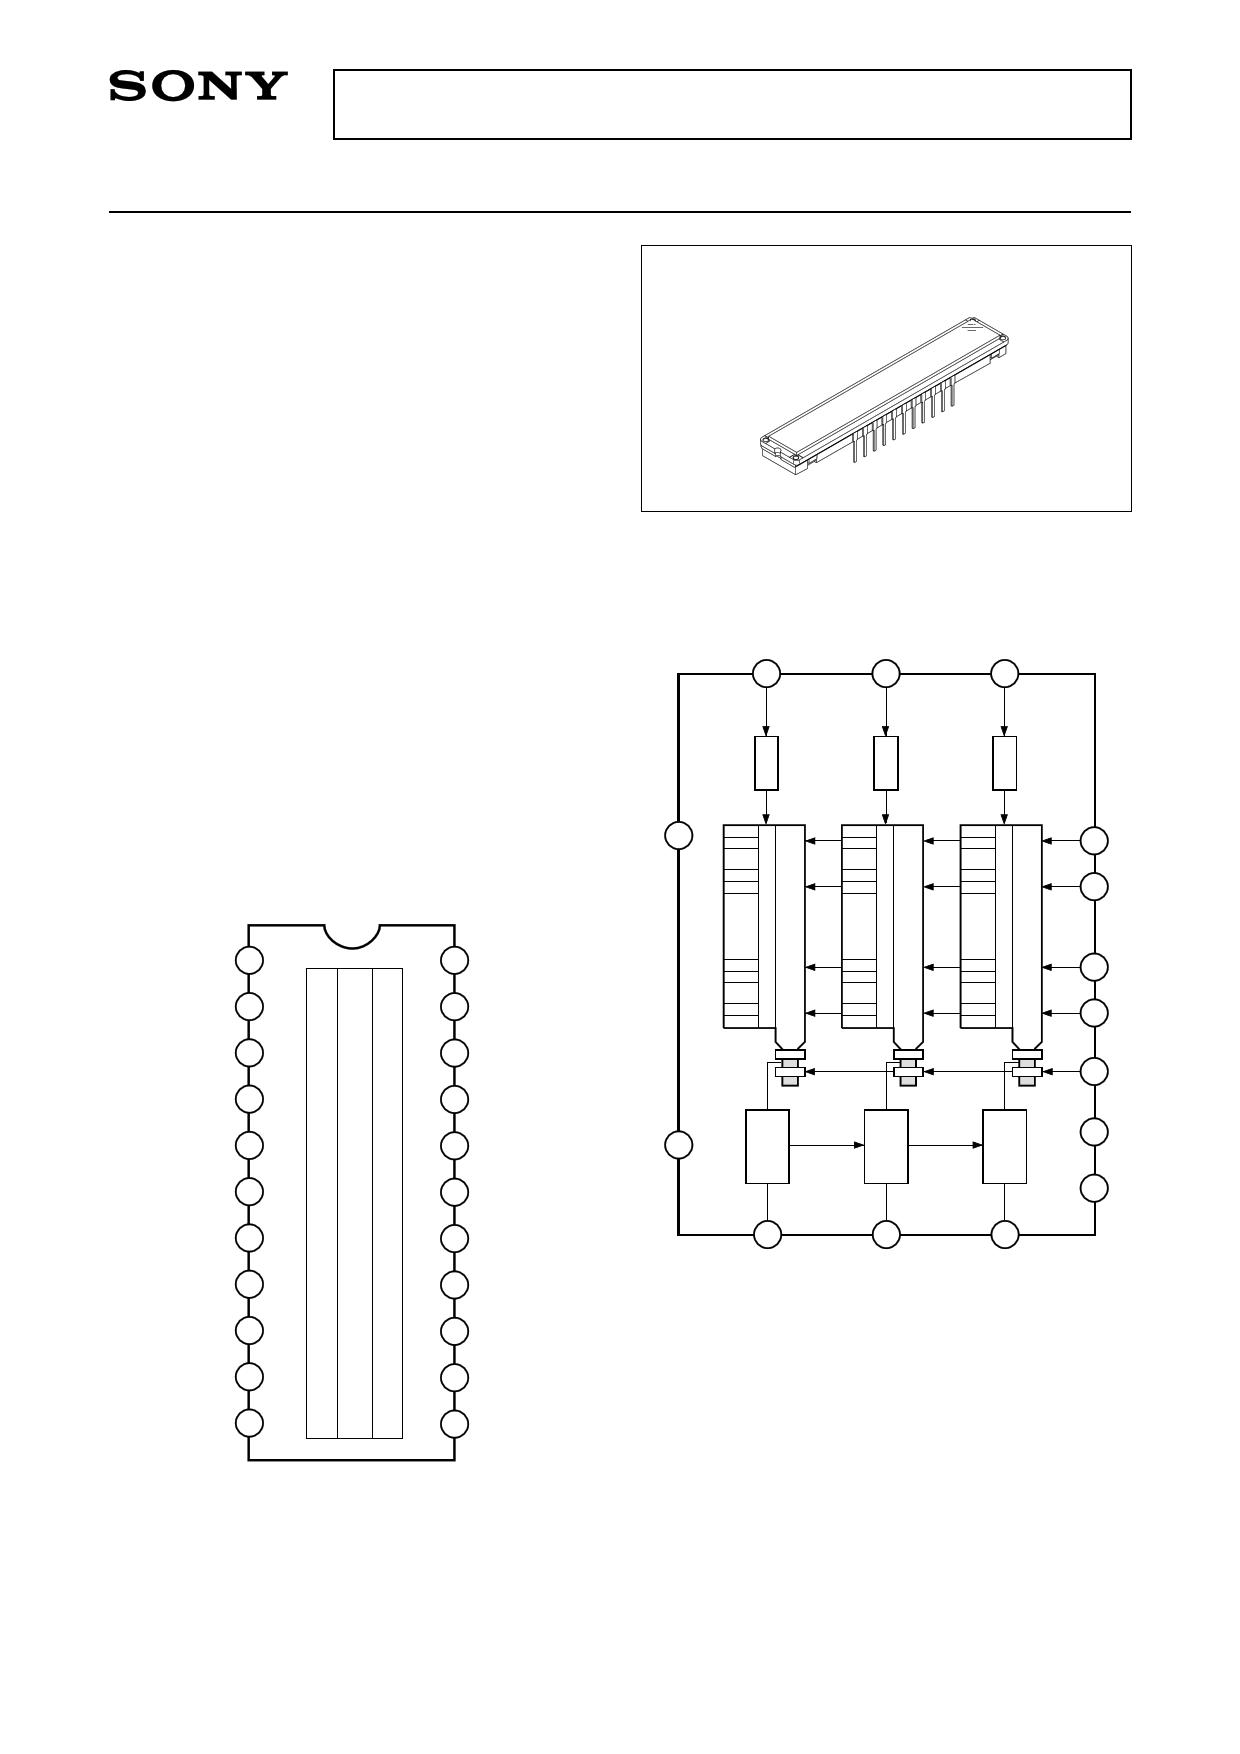 ilx555k datasheet pdf   pinout